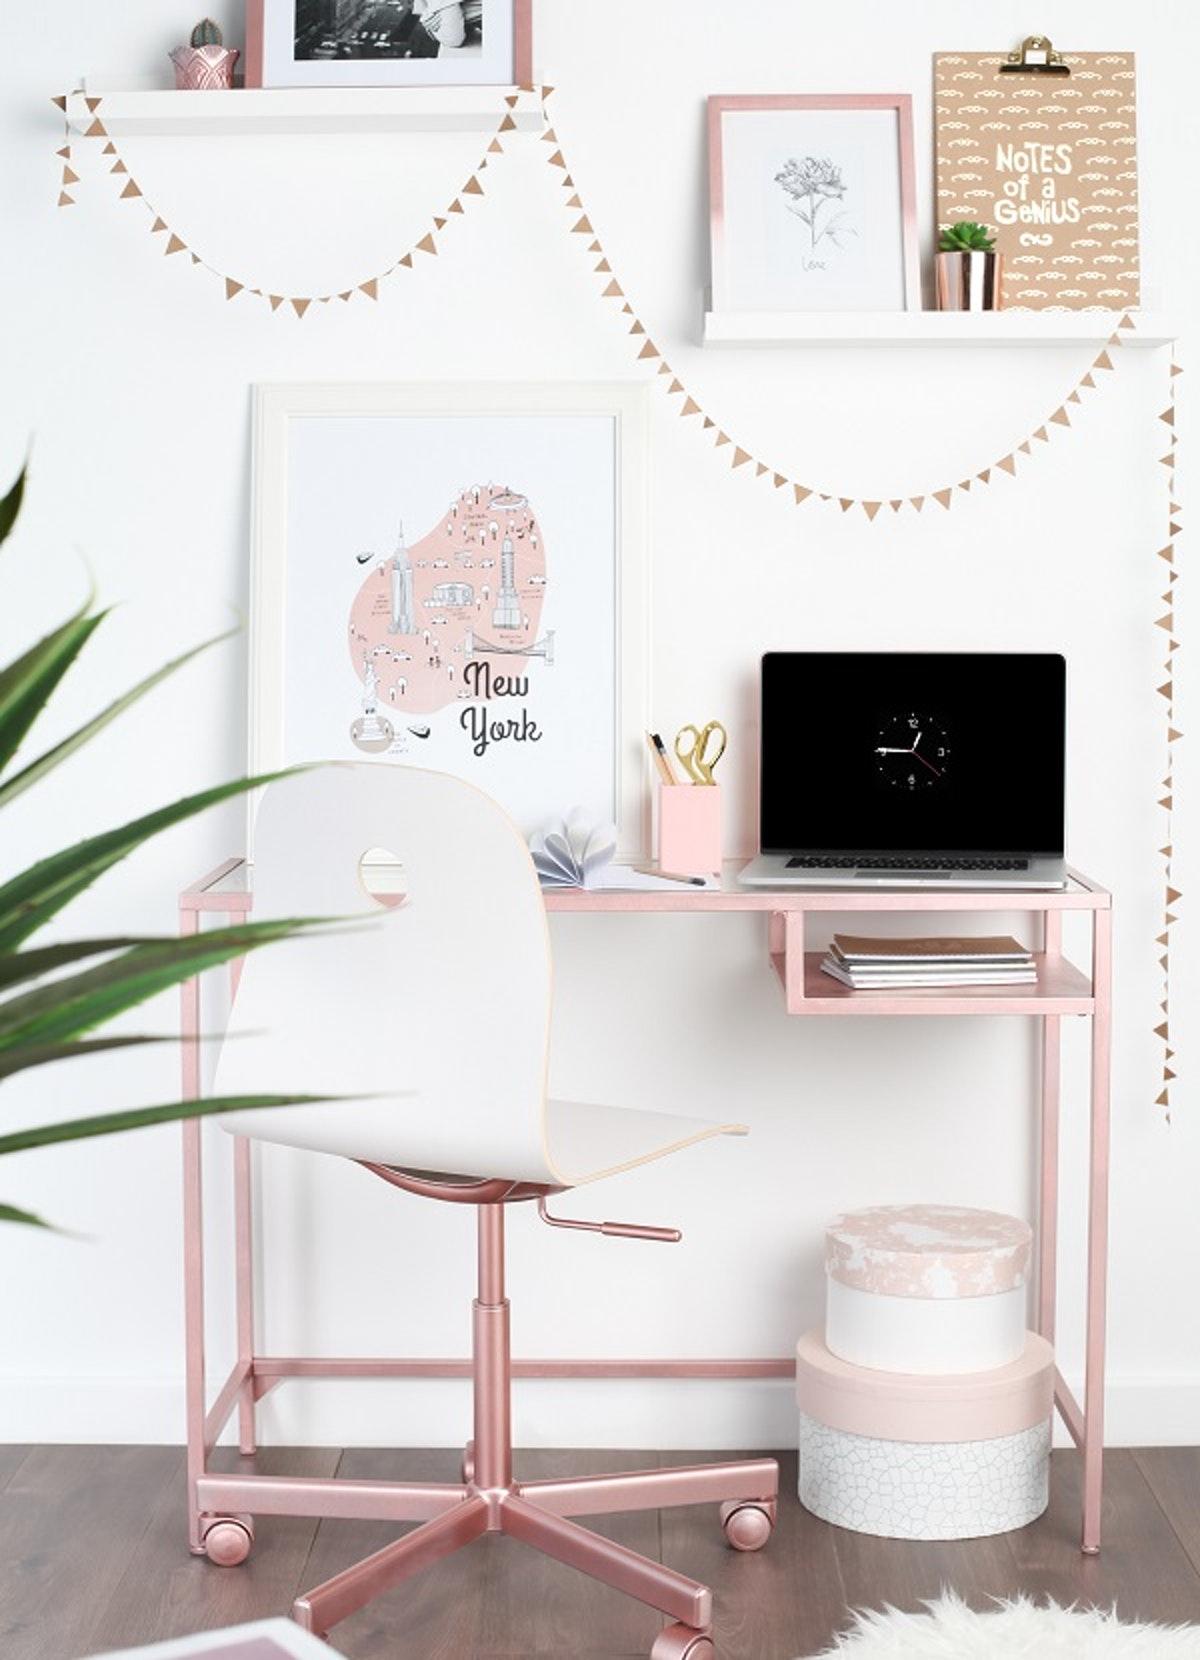 Beautiful Ikea hack of Vittsjo with rose gold paint via Heart Home Mag. 11 Super Simple Ikea Hacks for Vittsjo Desk & Shelf!